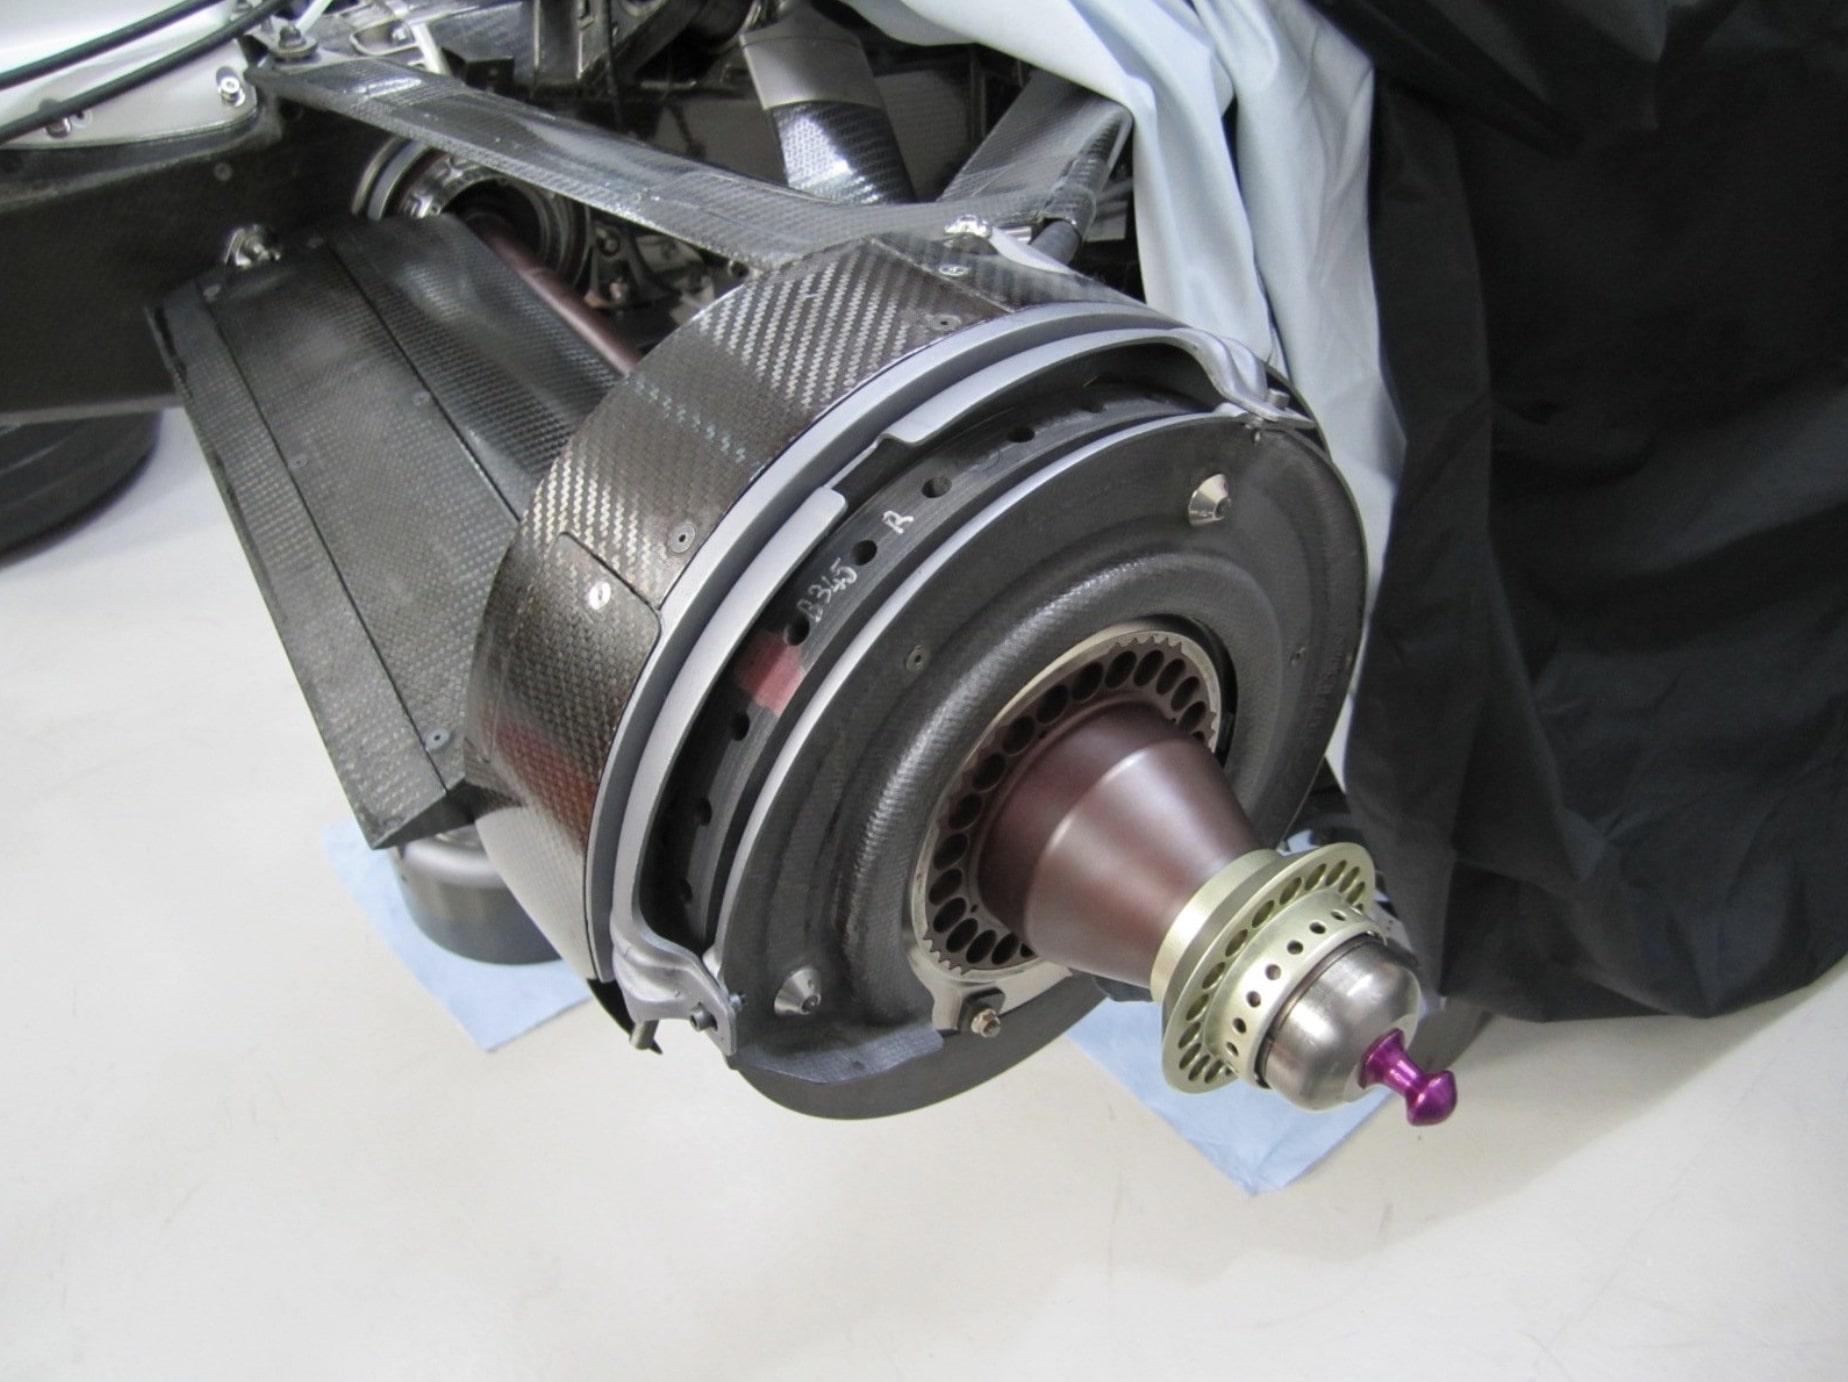 BAR-Honda Bonneville (8)